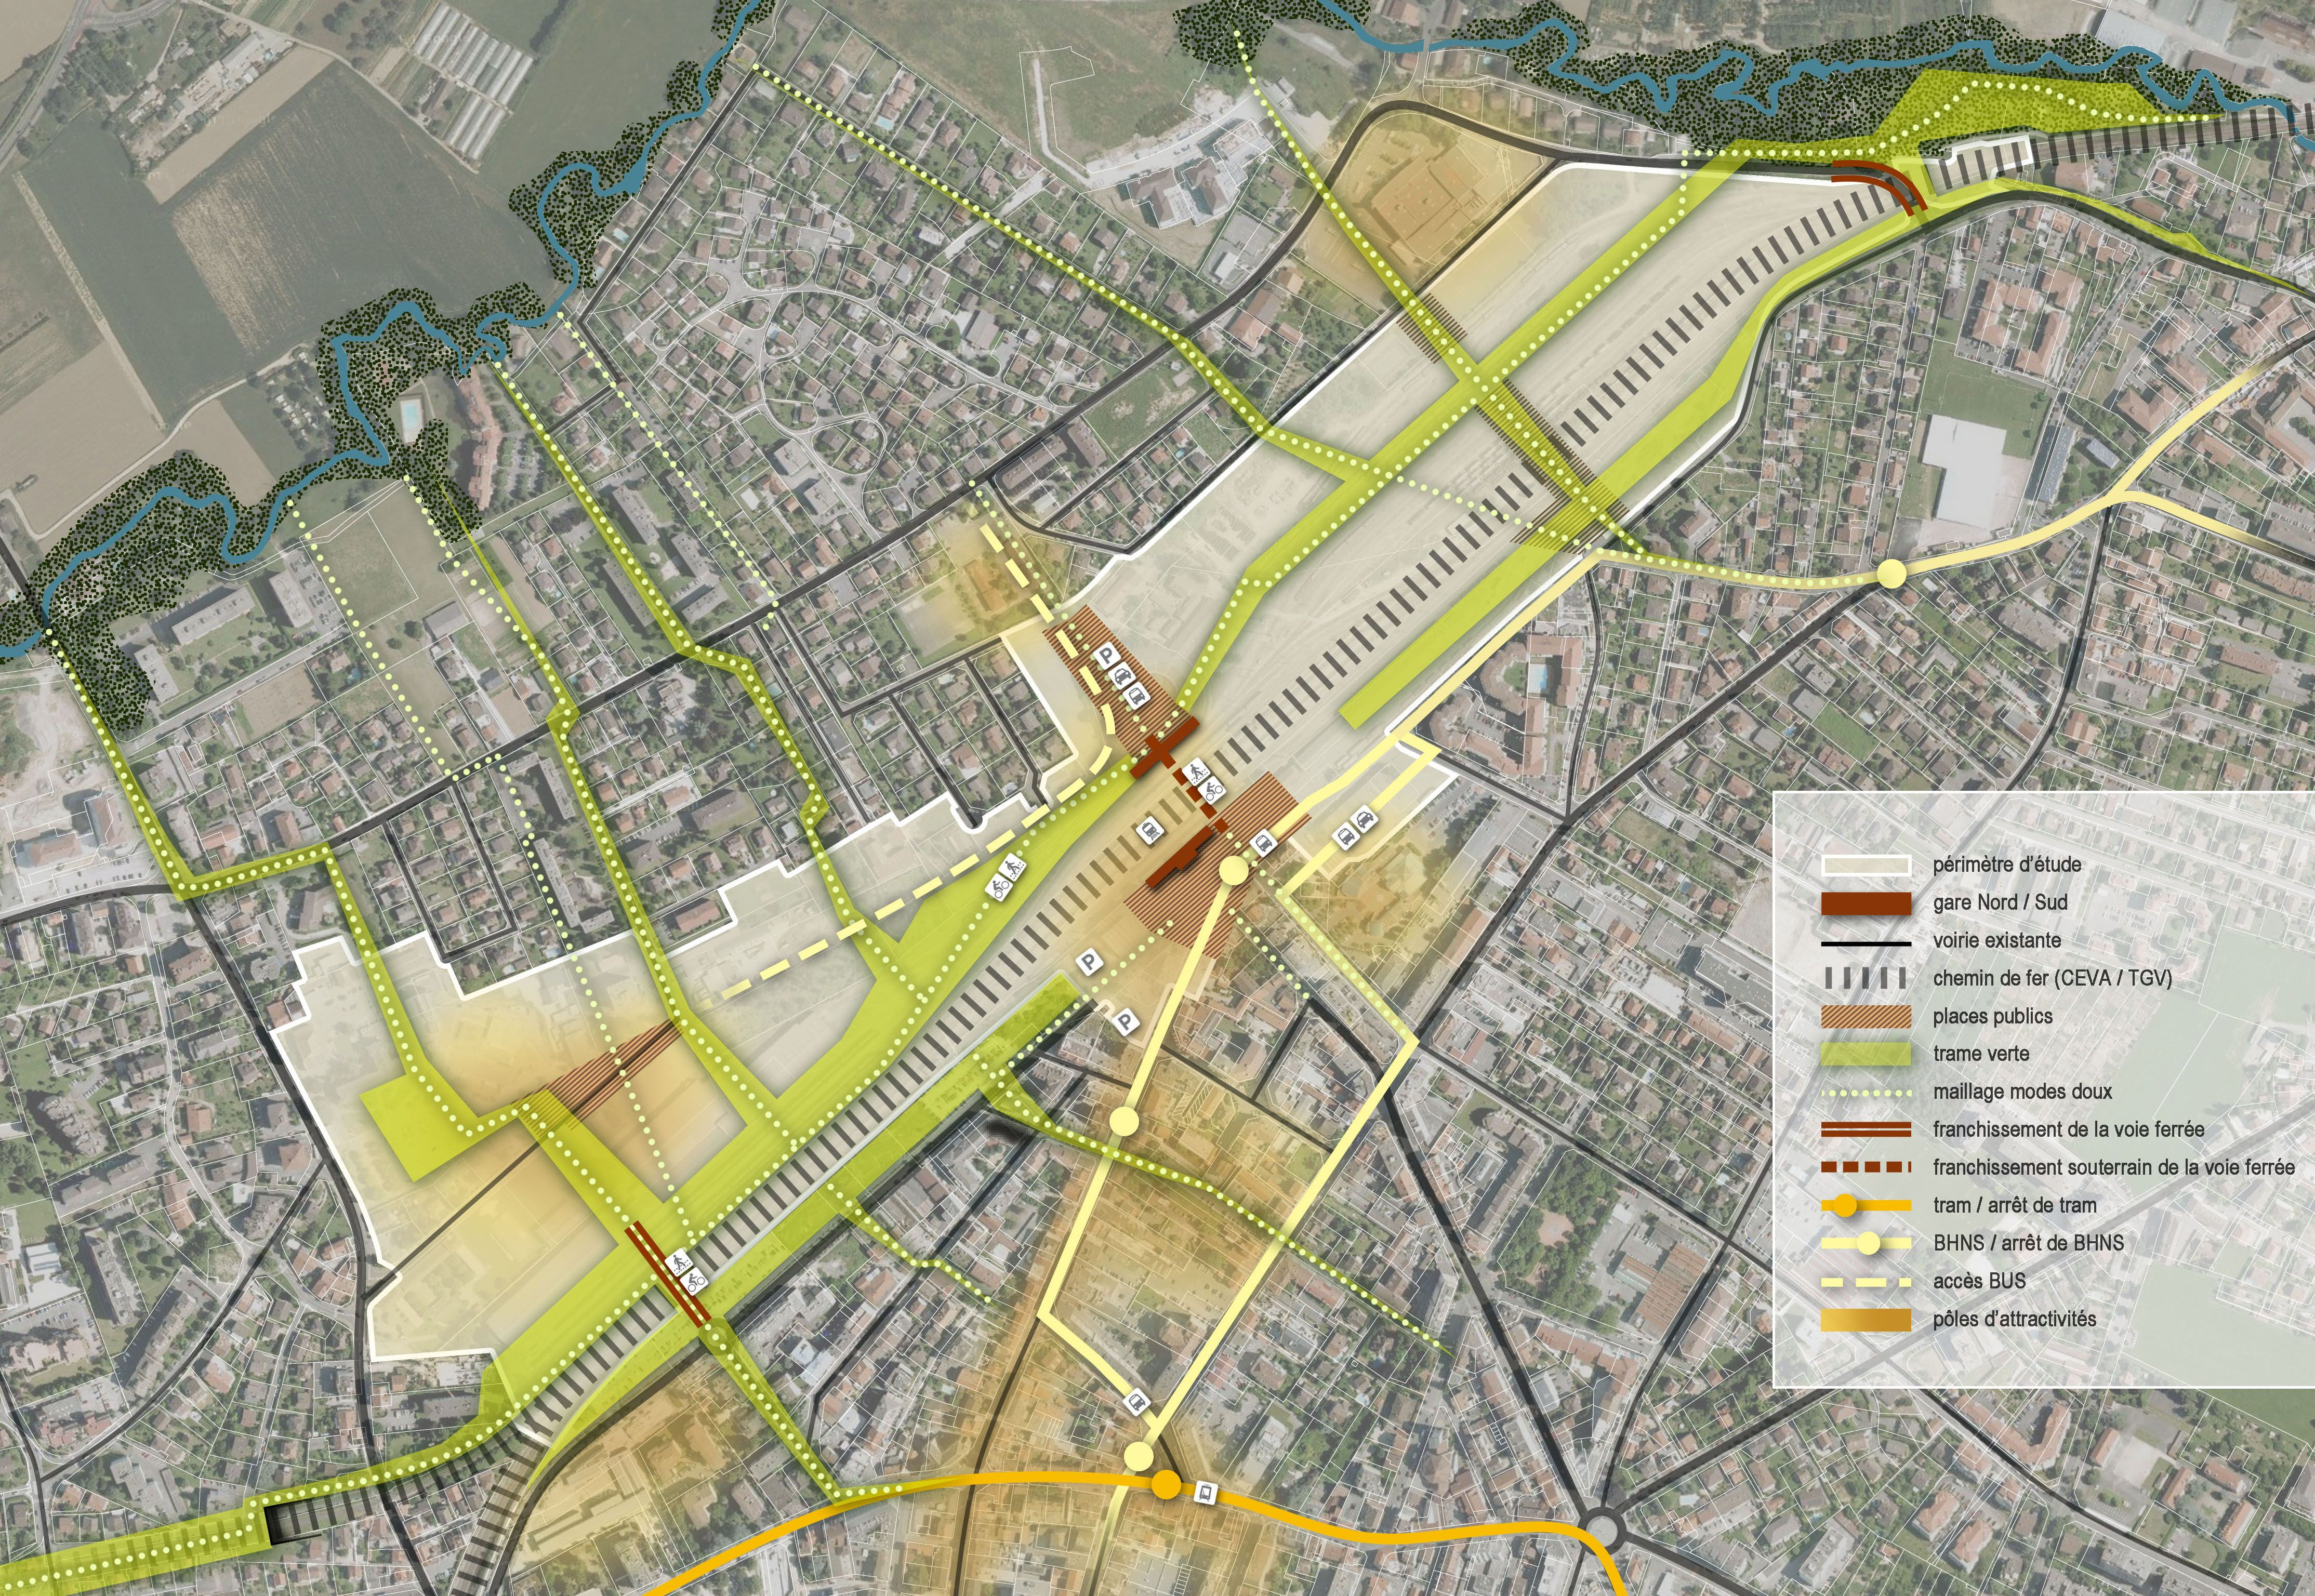 Atelier villes paysages annemasse projet urbain for Agence empreinte paysage